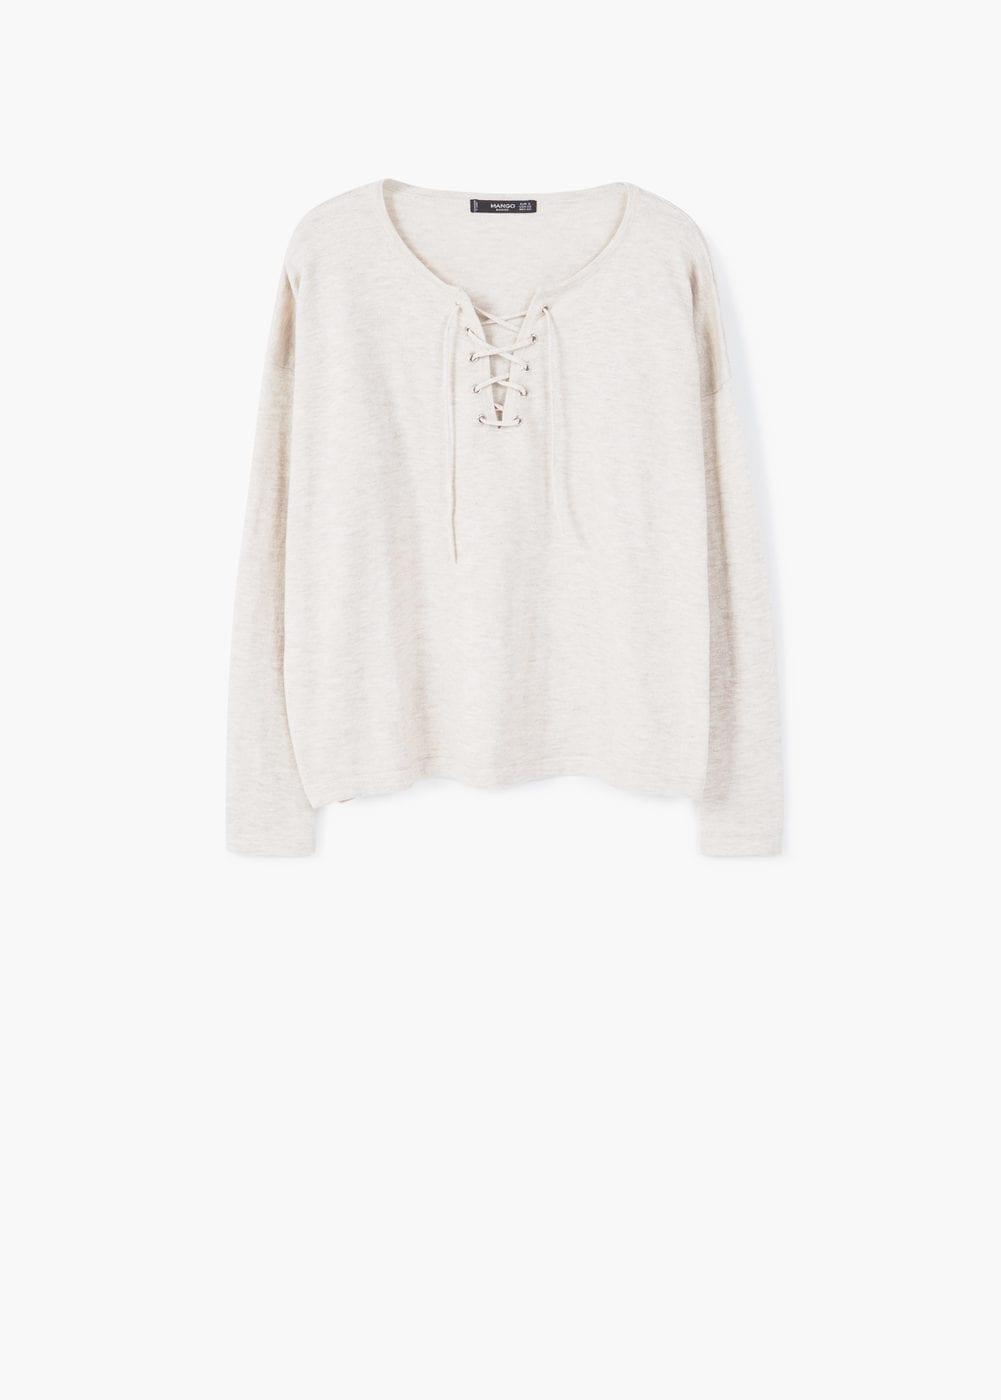 Mango Cord Sweater $35.99